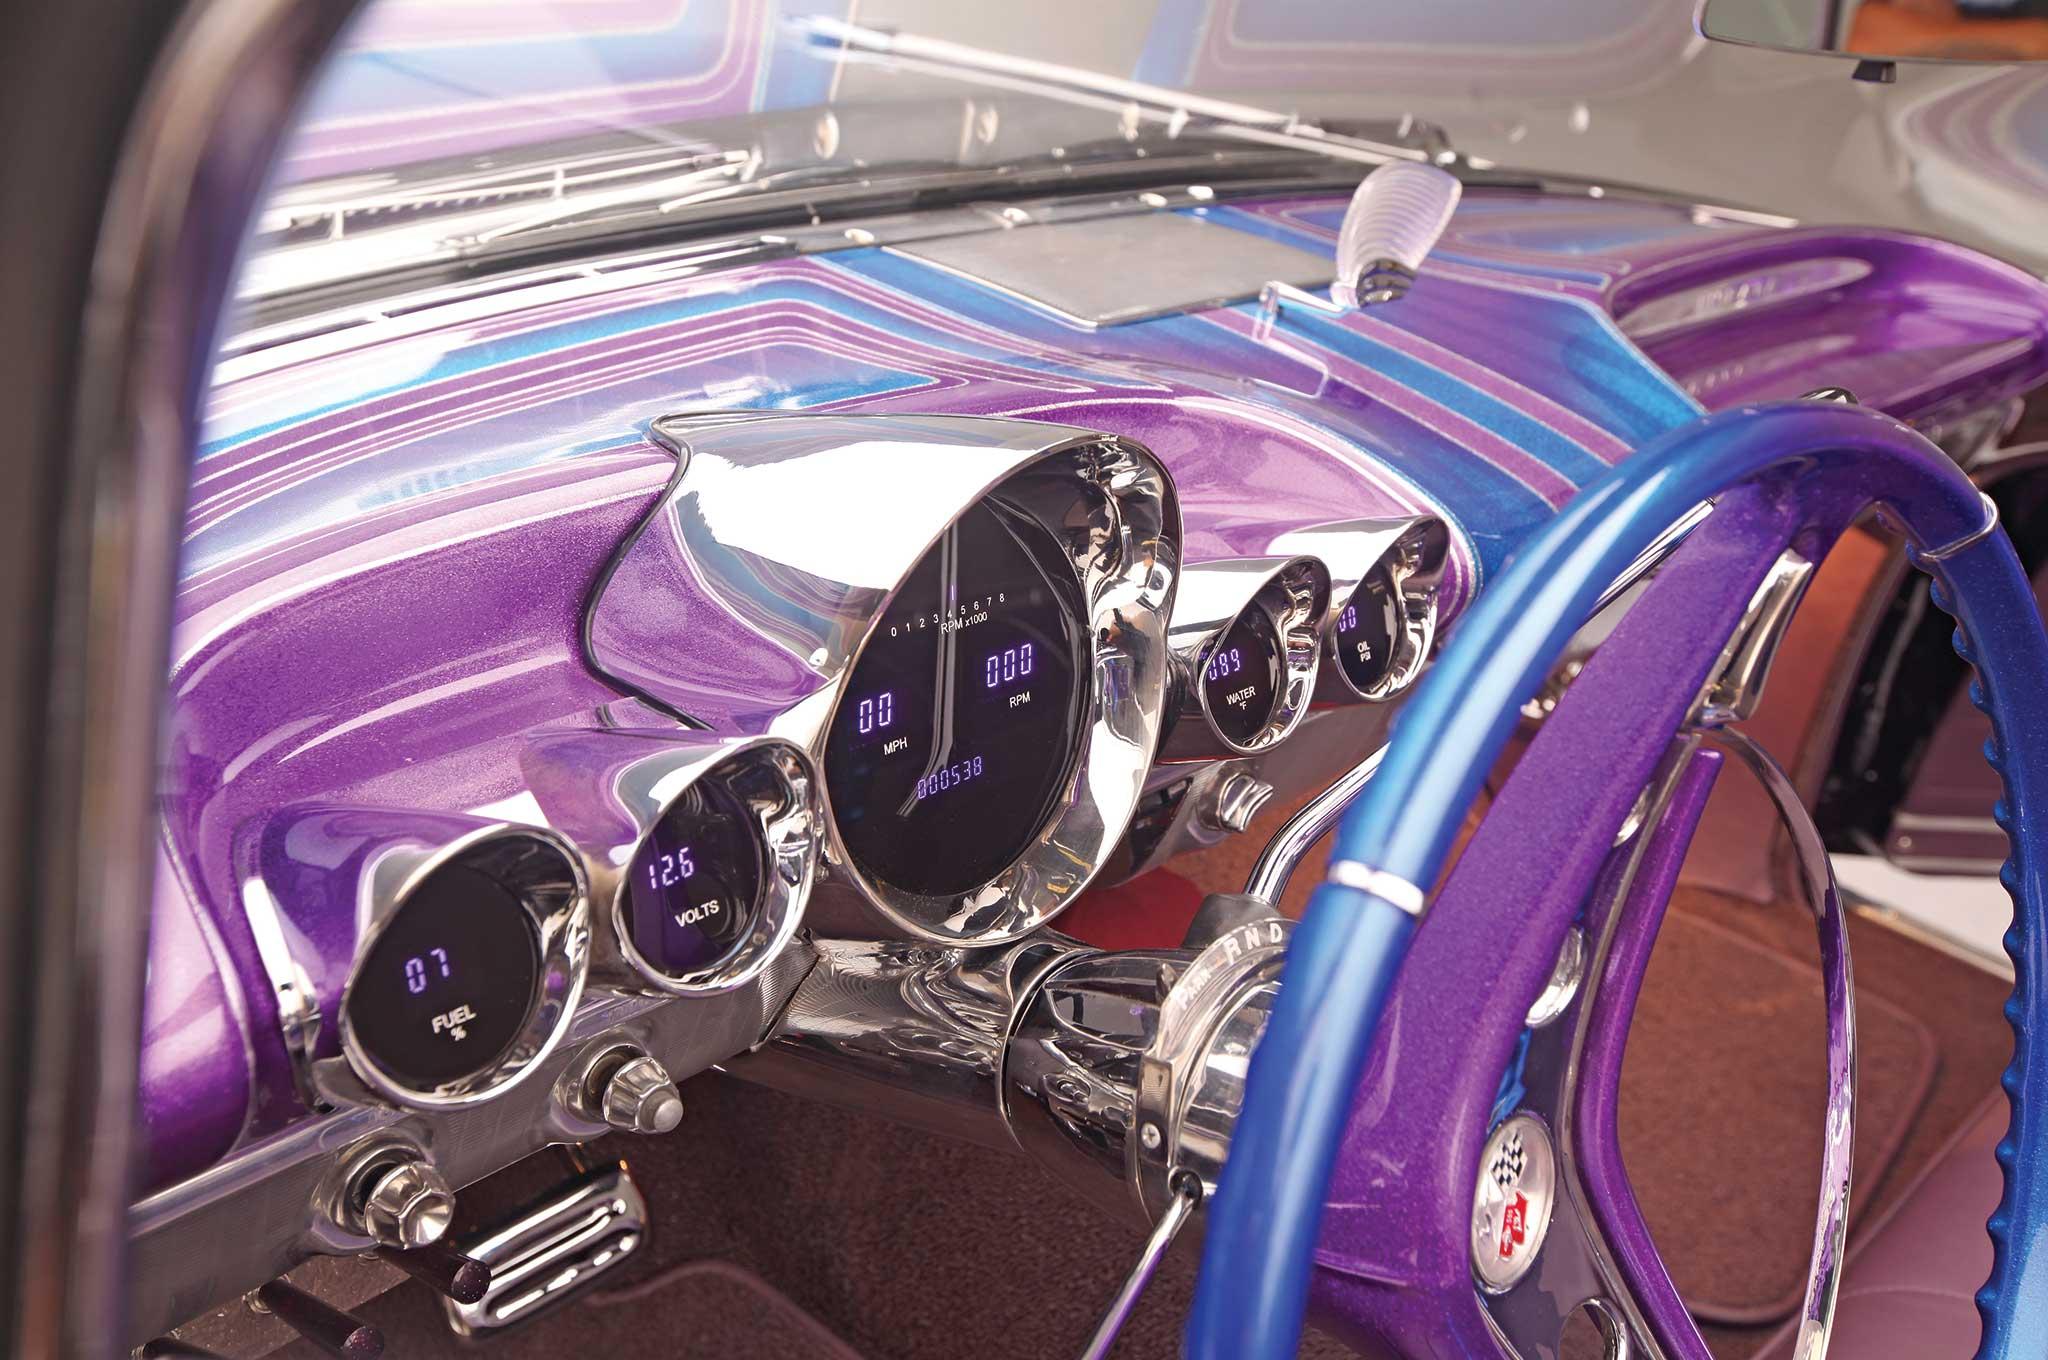 006 1959 chevrolet impala convertible digital gauge cluster